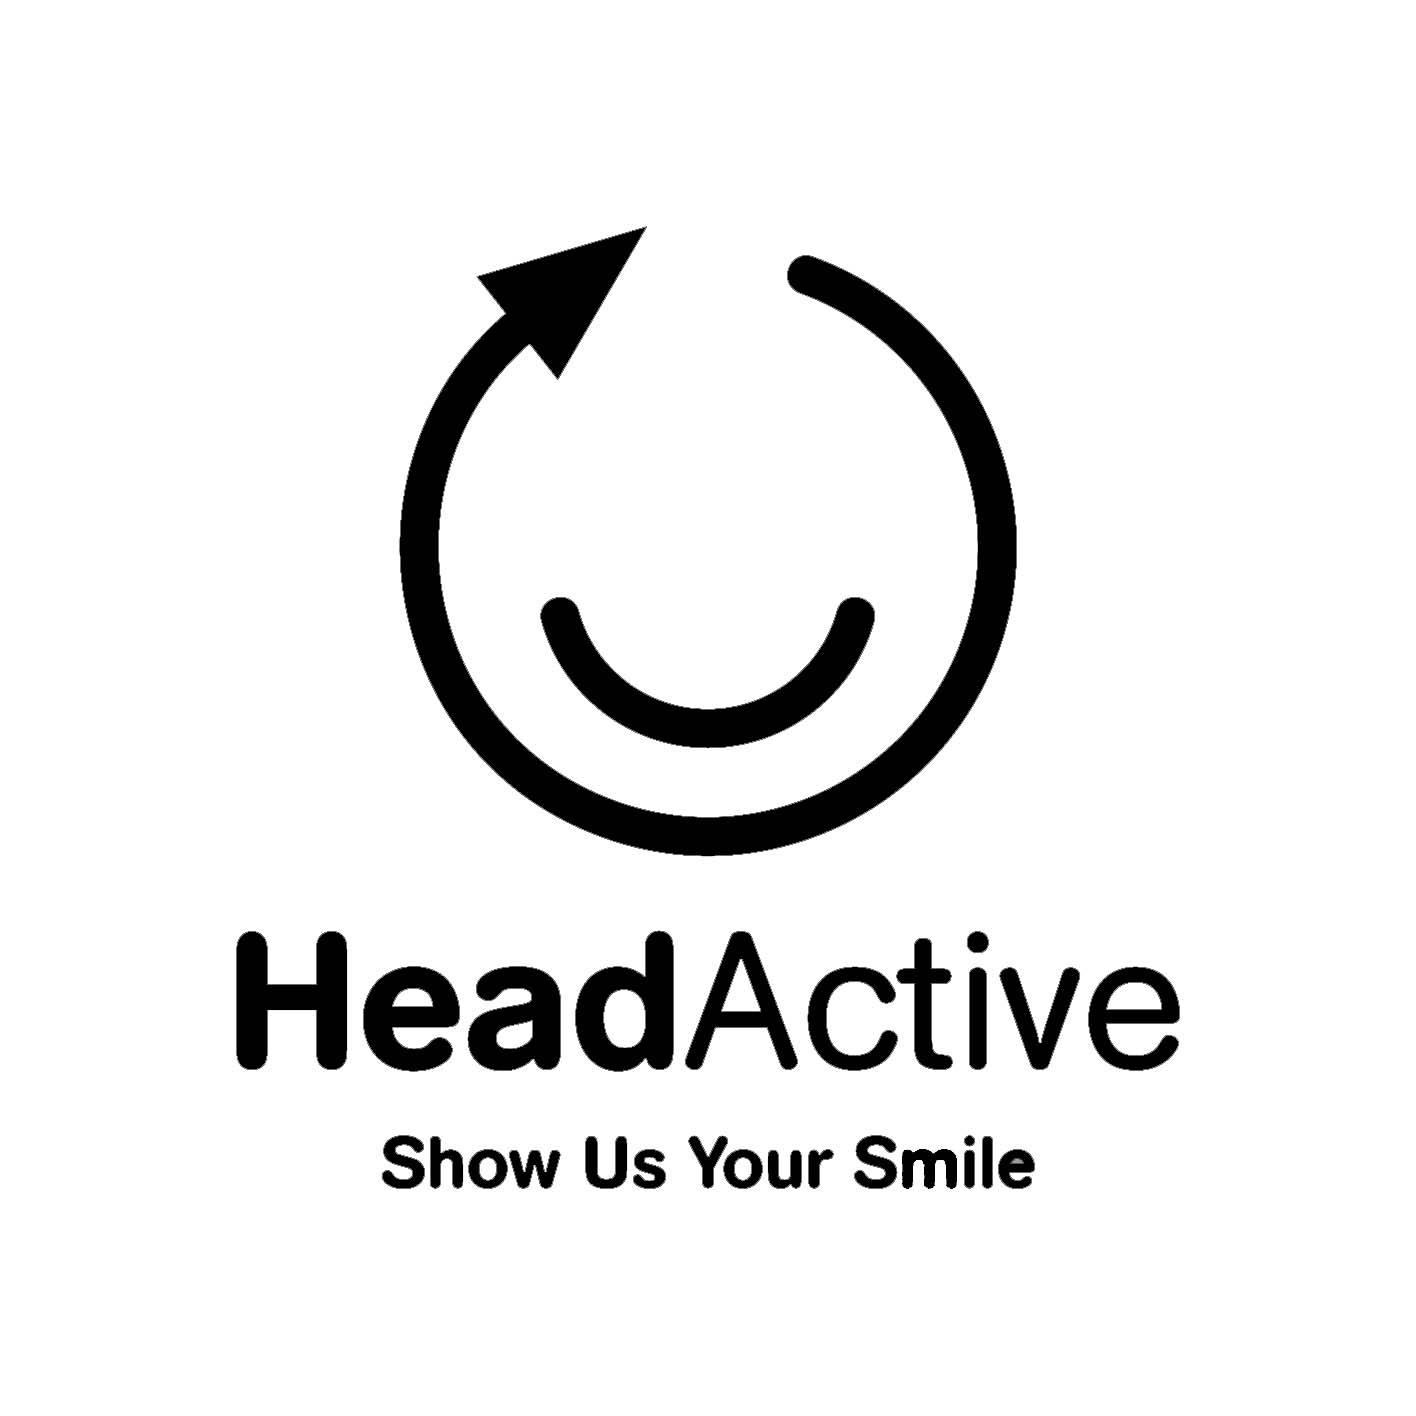 Head Active